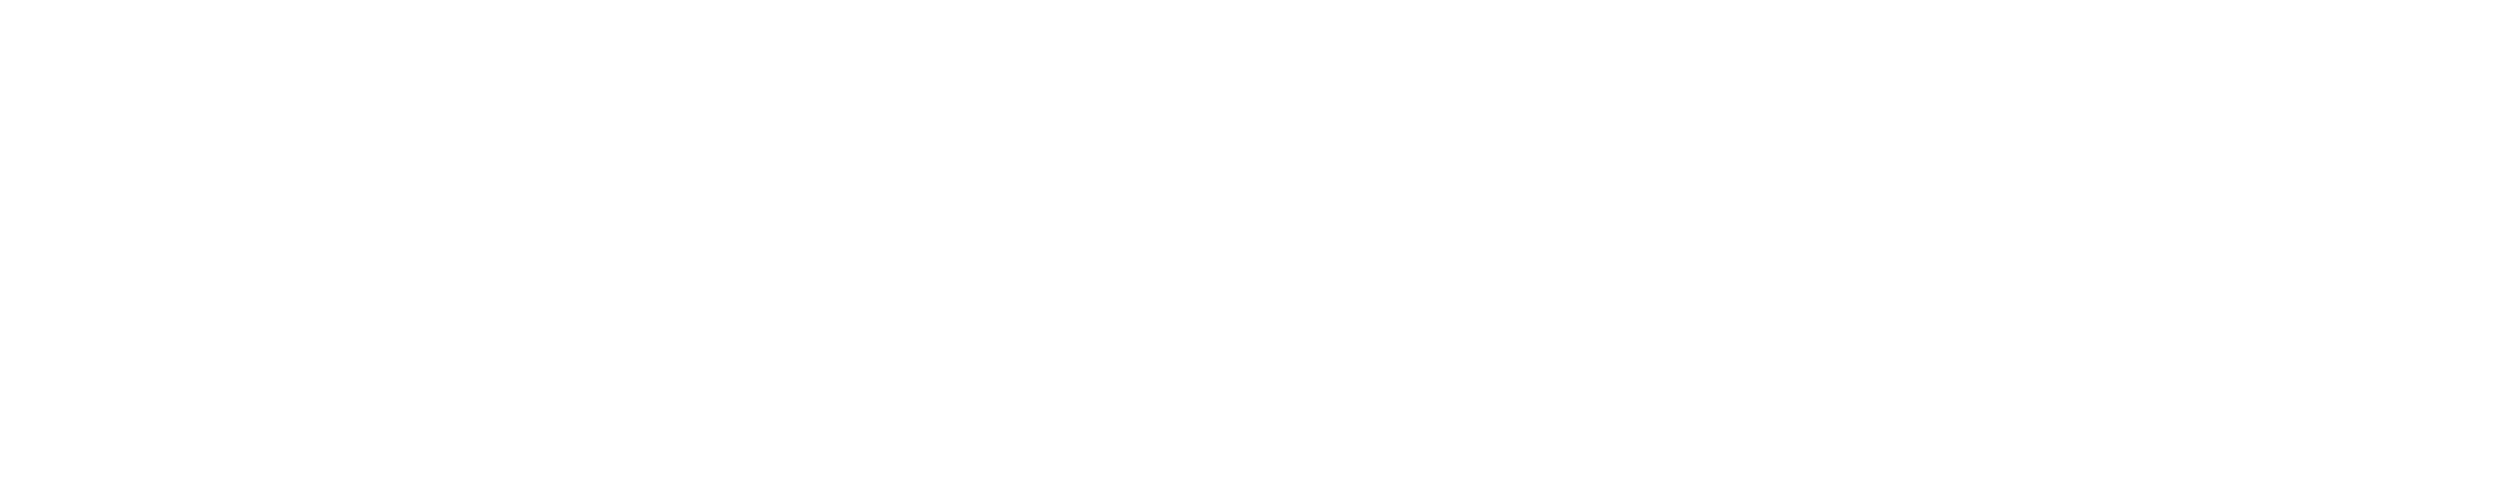 bburro_logo.jpg